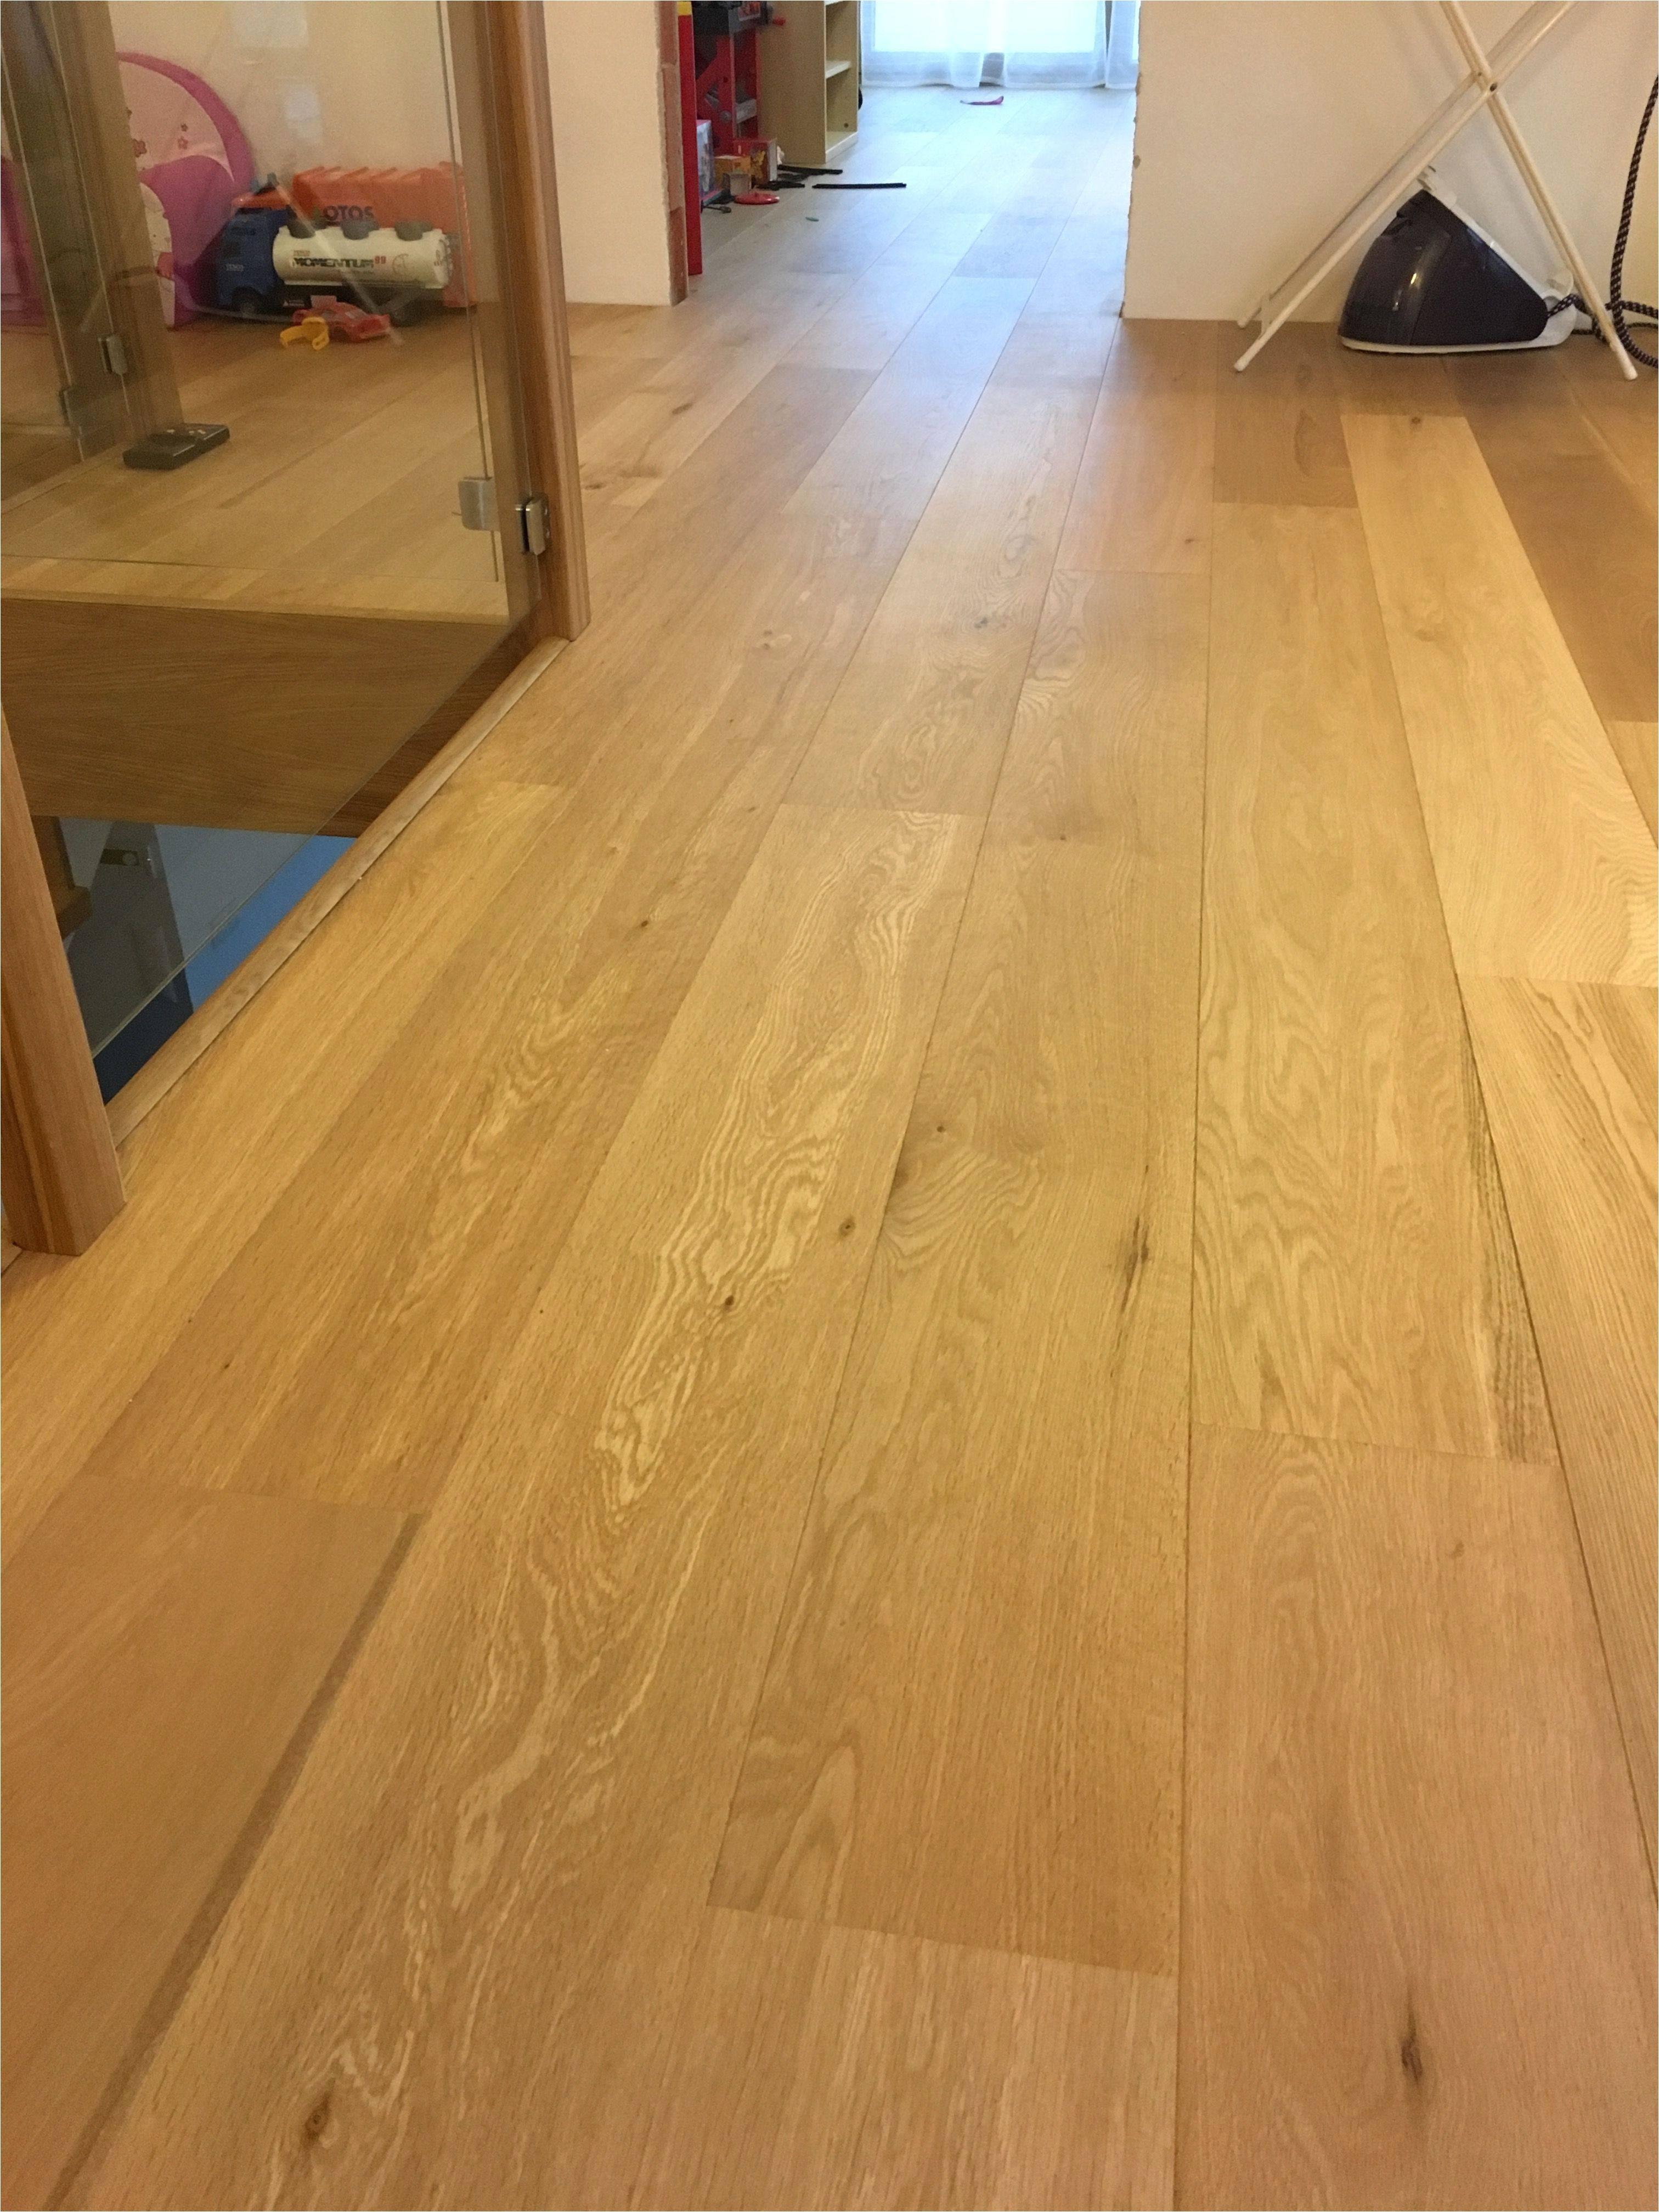 Eucalyptus Flooring Pros and Cons 20 Hickory Flooring Pros and Cons You Ll Love Best Flooring Ideas